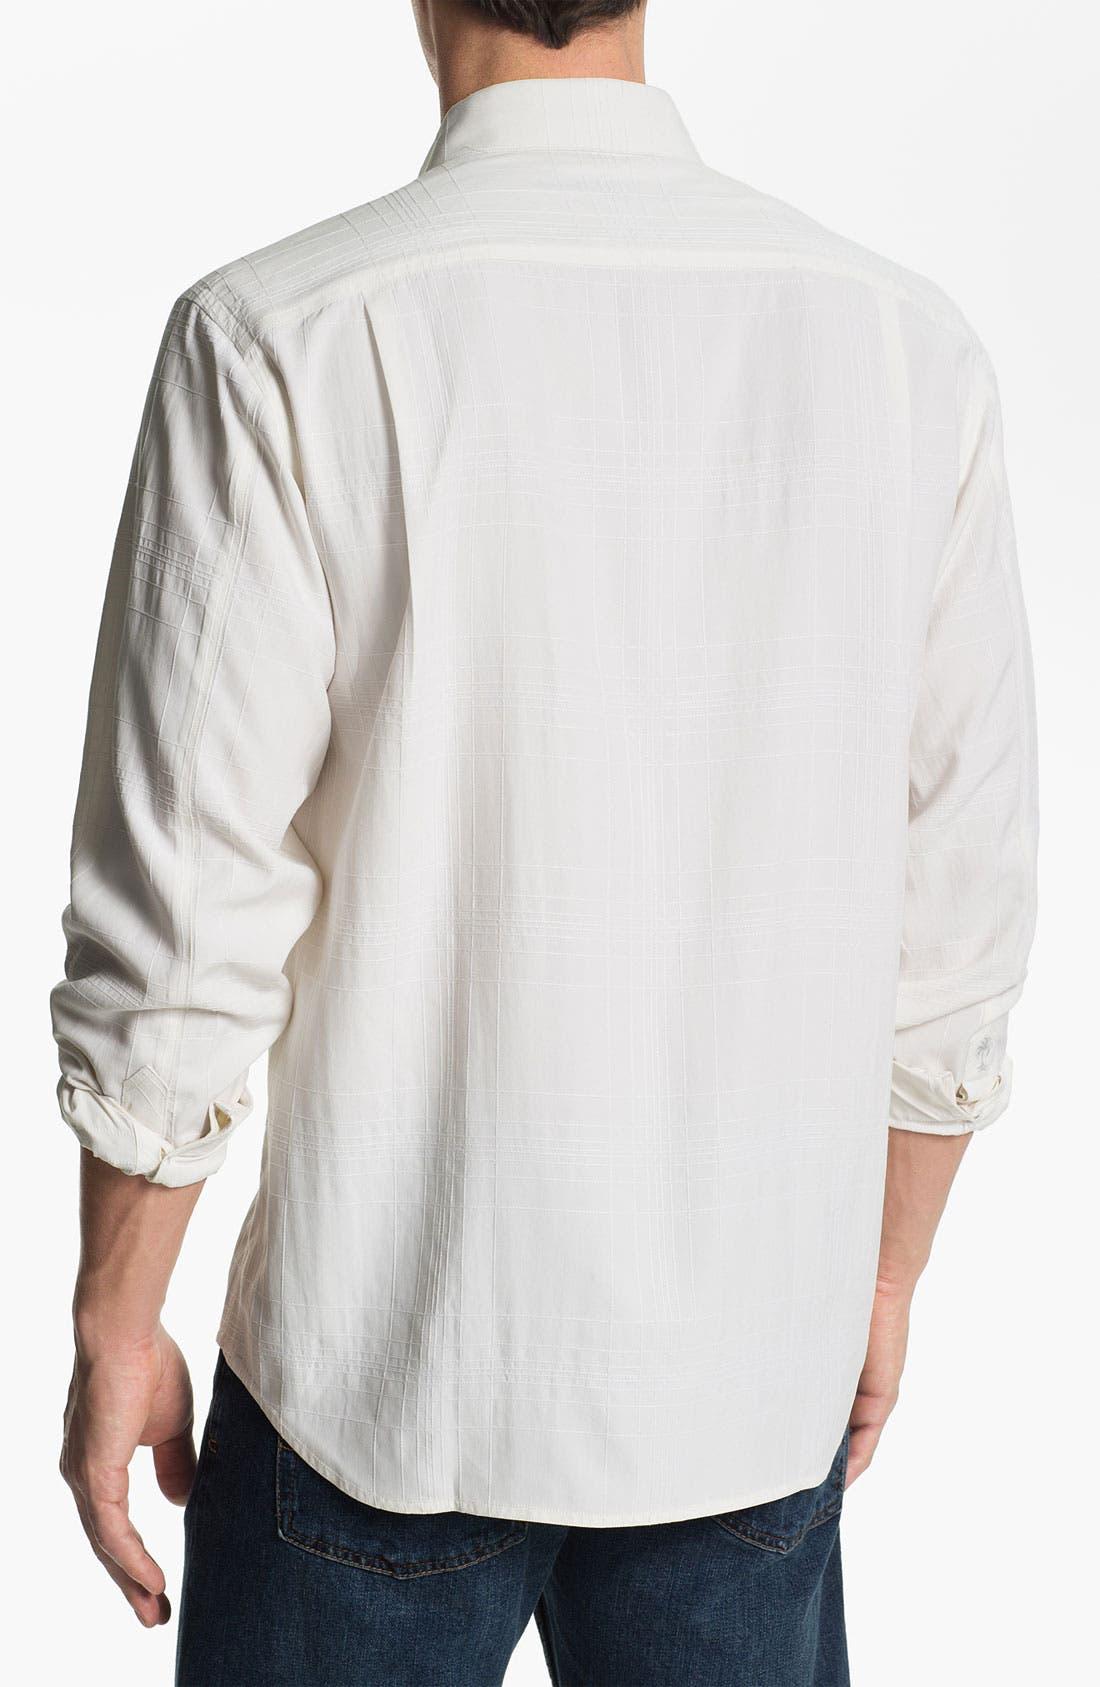 Alternate Image 2  - Tommy Bahama 'Skyscraper' Silk Sport Shirt (Big & Tall)